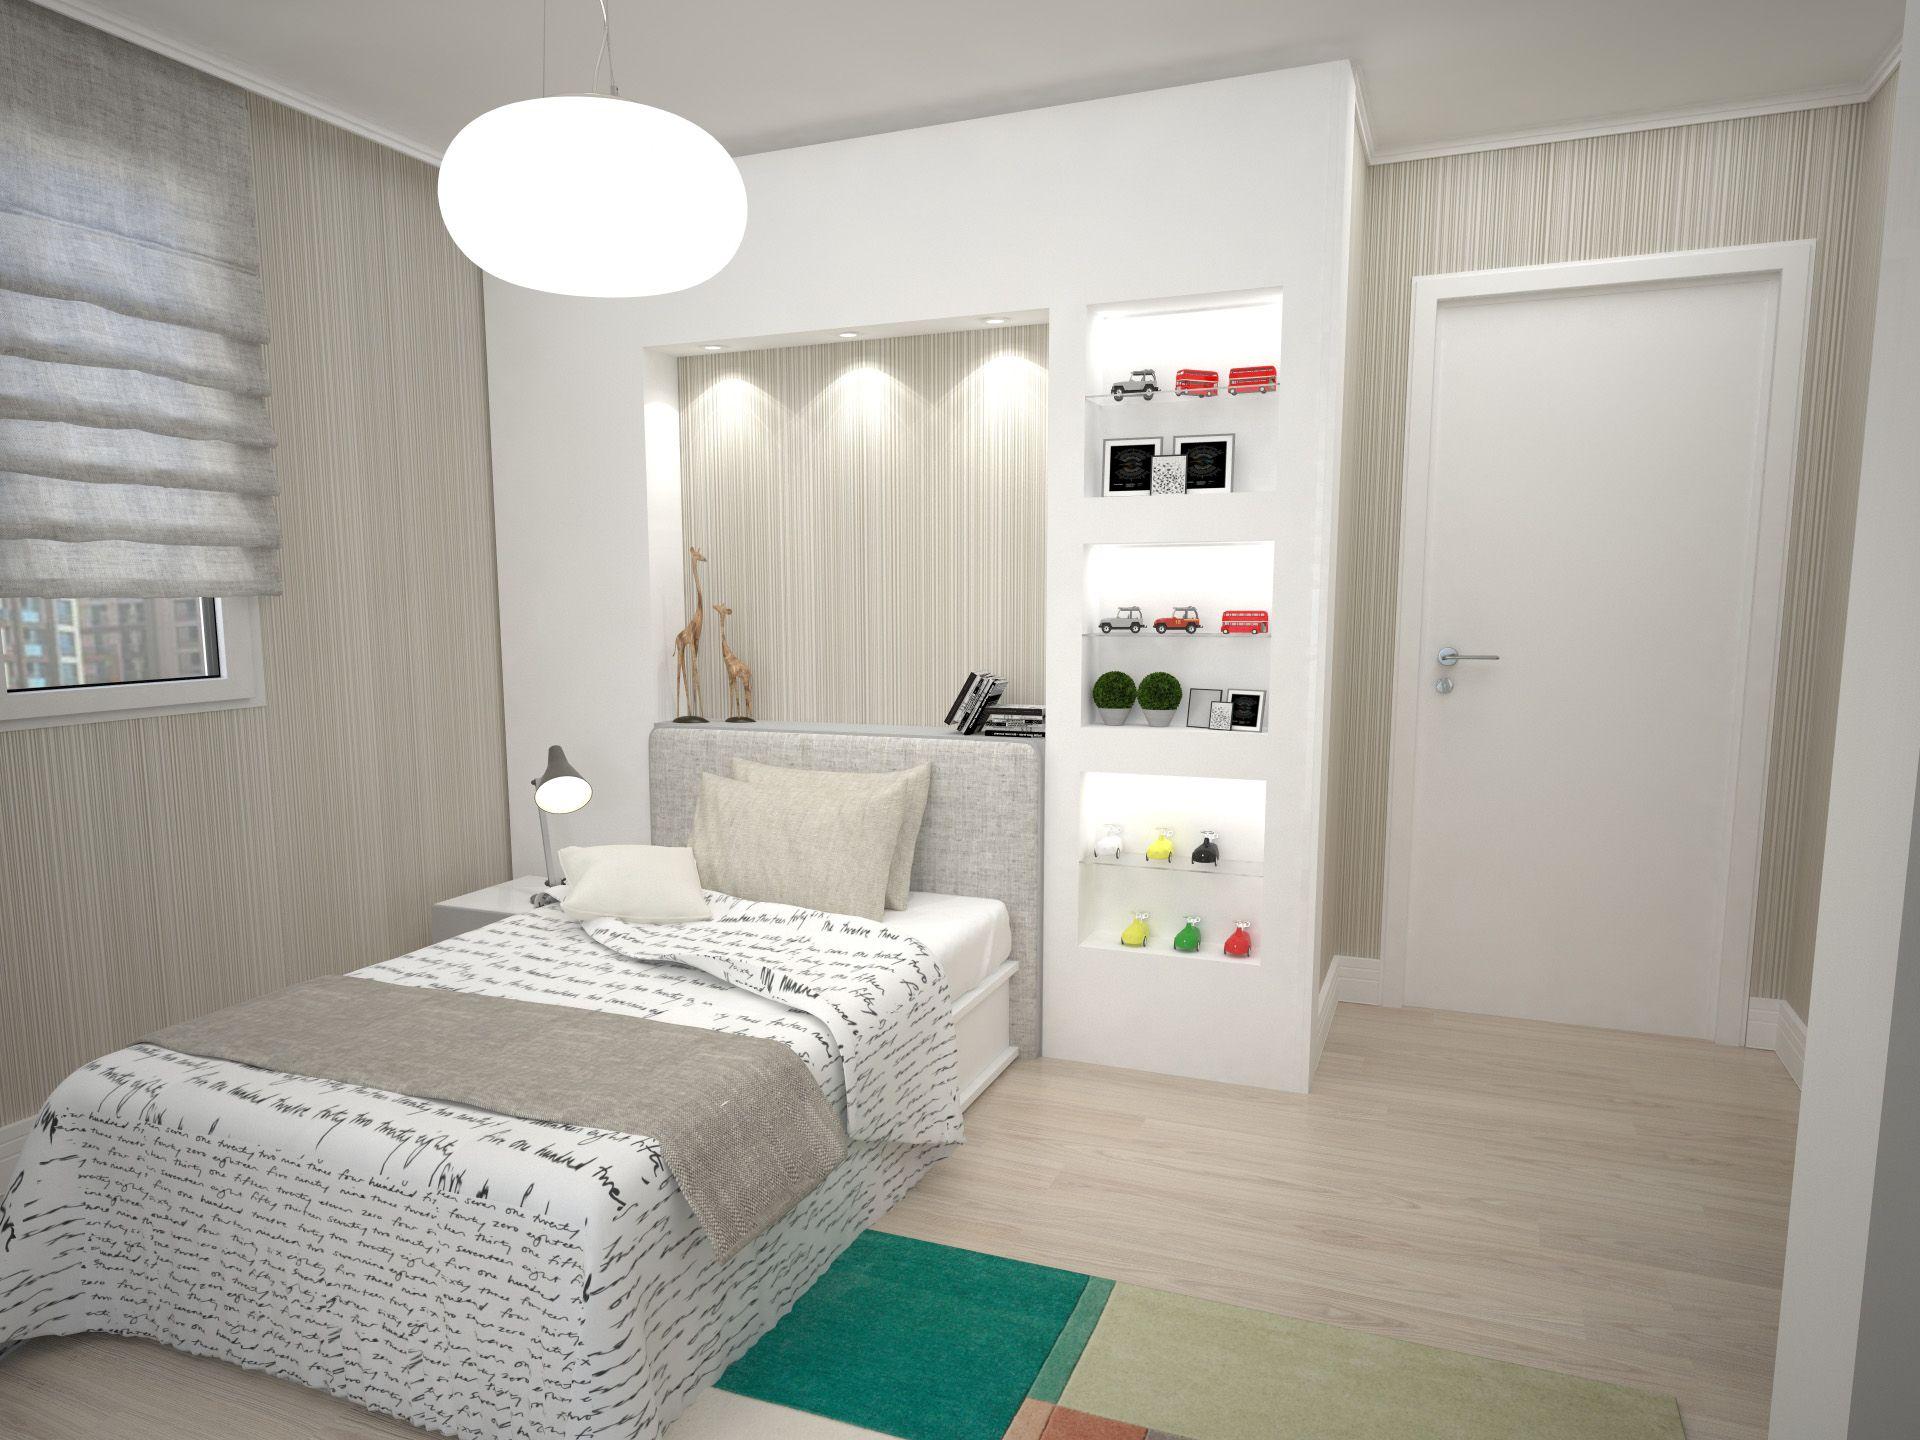 Genc Odasi Tasarimi Bf Ic Mimarlik Bedroom Design